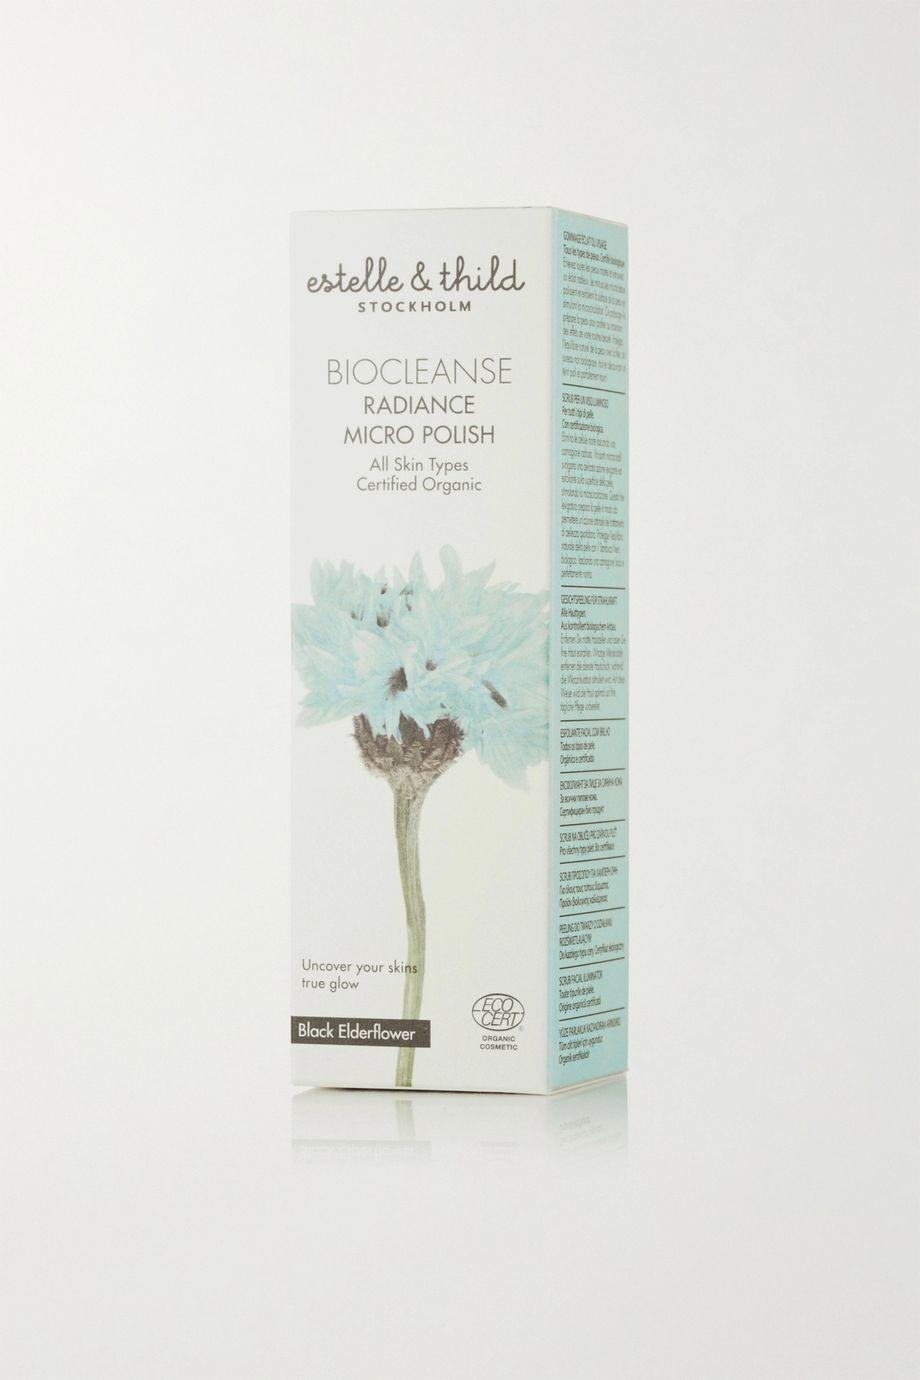 Estelle & Thild BioCleanse Radiance Micro Polish, 50ml